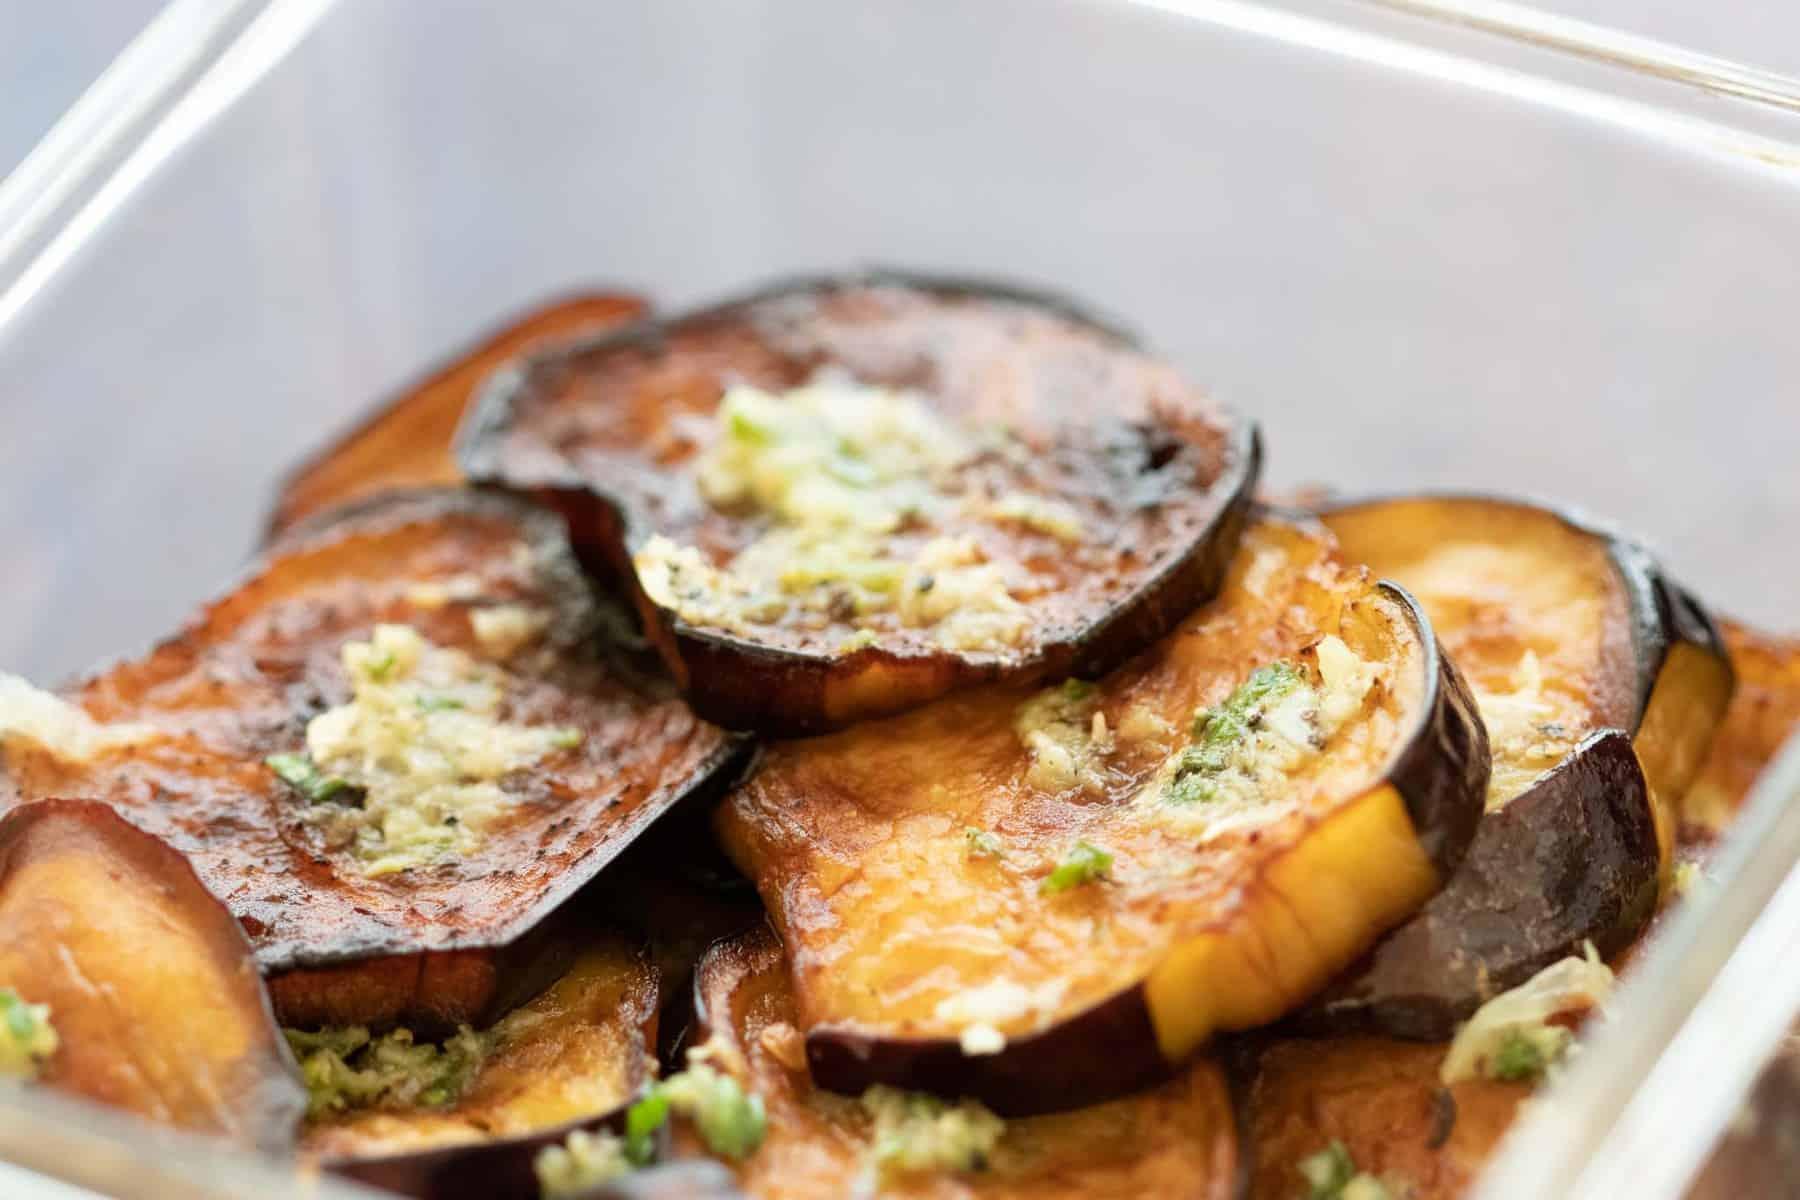 fried egpplant with garlic